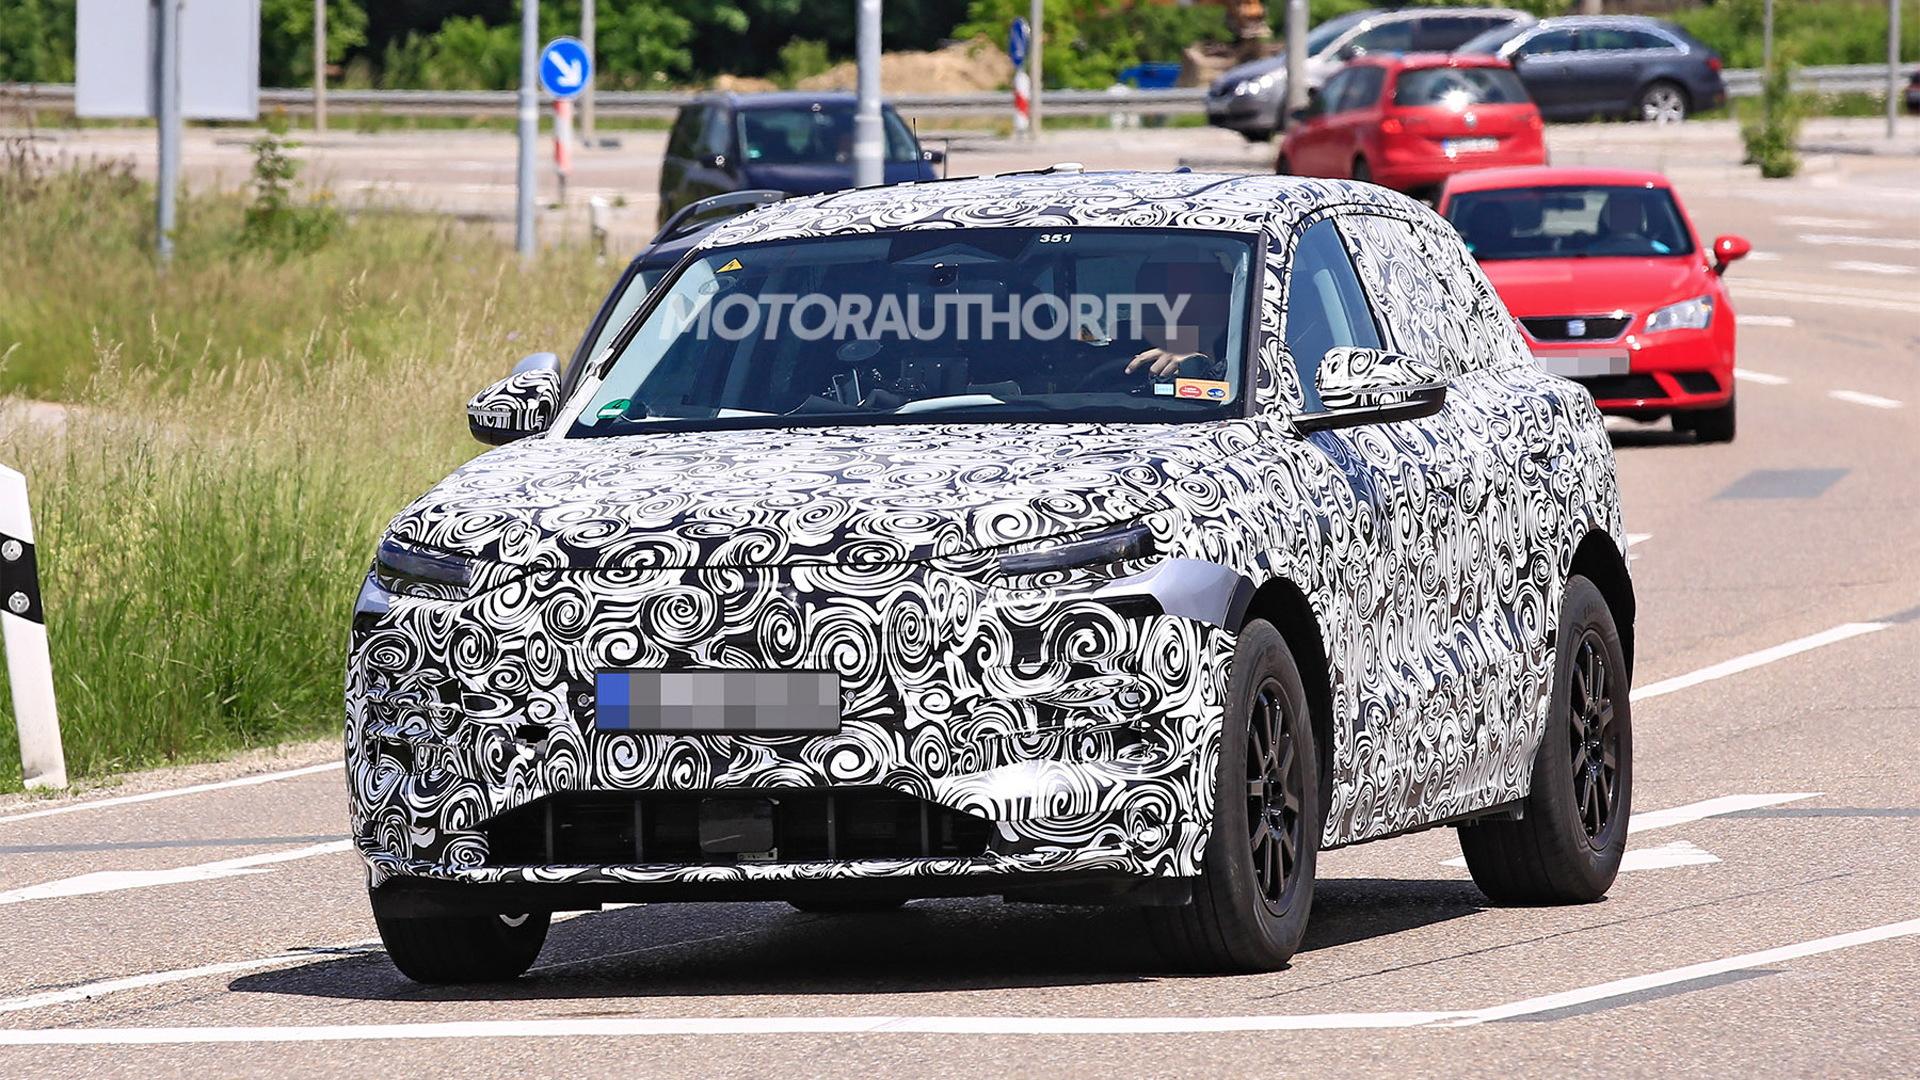 2023 Audi Q6 E-Tron spy shots - Photo credit:S. Baldauf/SB-Medien